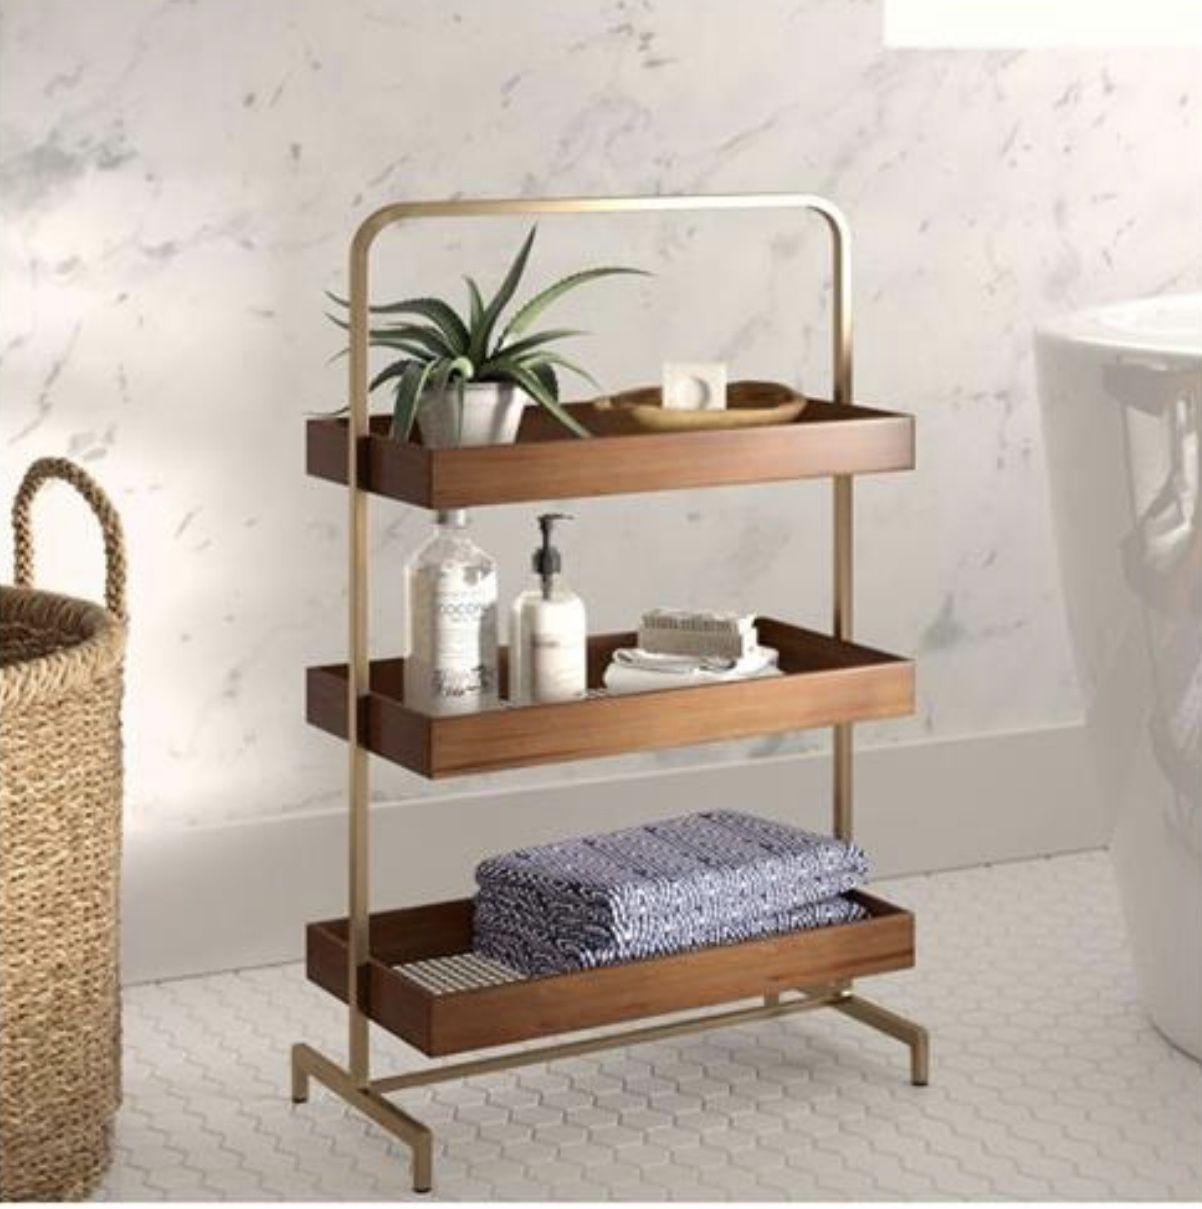 Pin by A Doyle on Home inspiration  Shelves, Decor, Bathroom shelves